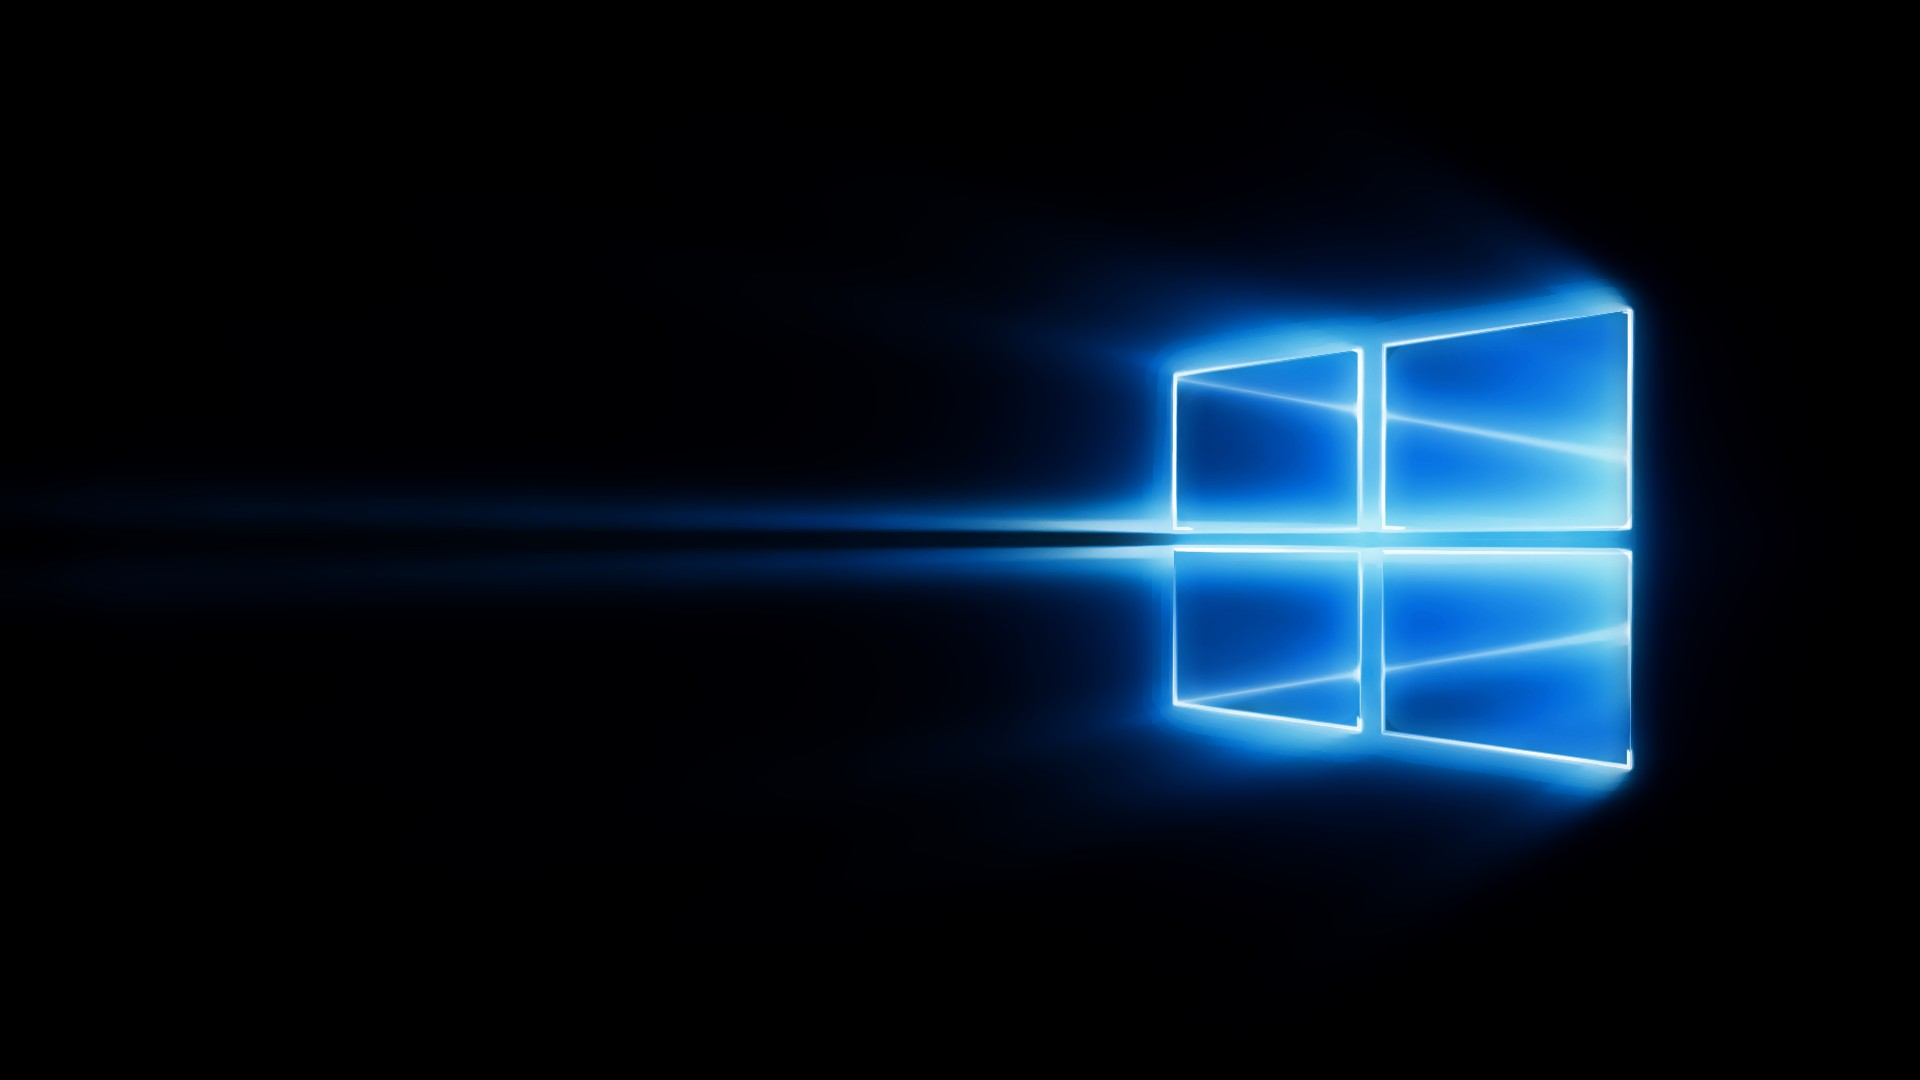 Windows 10 HD Wallpaper ·① Download Free Amazing